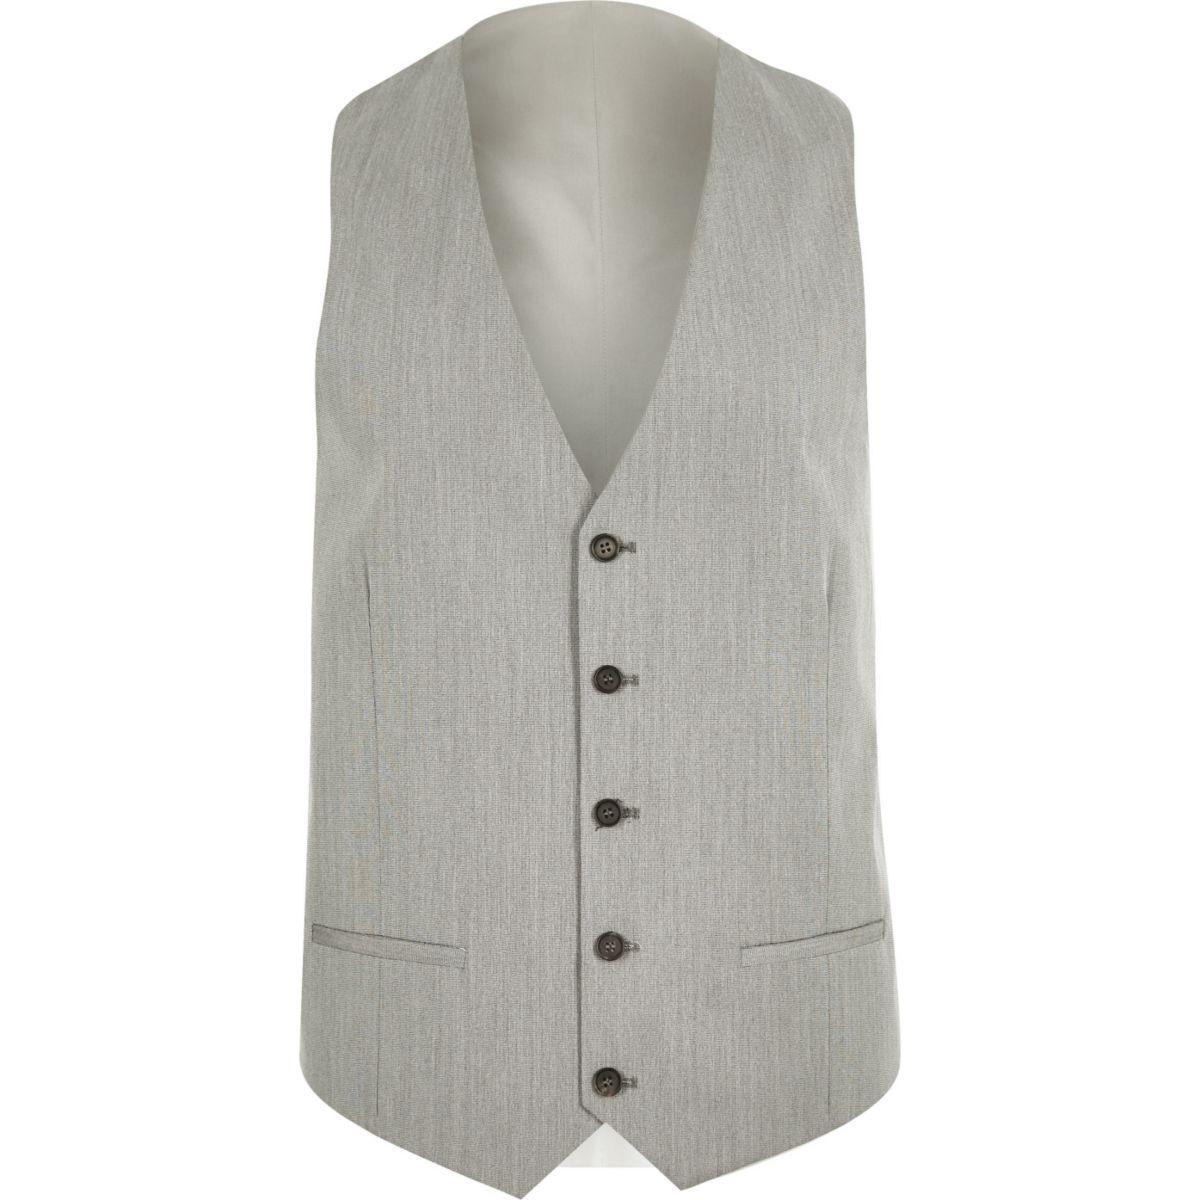 Grey slim suit vest